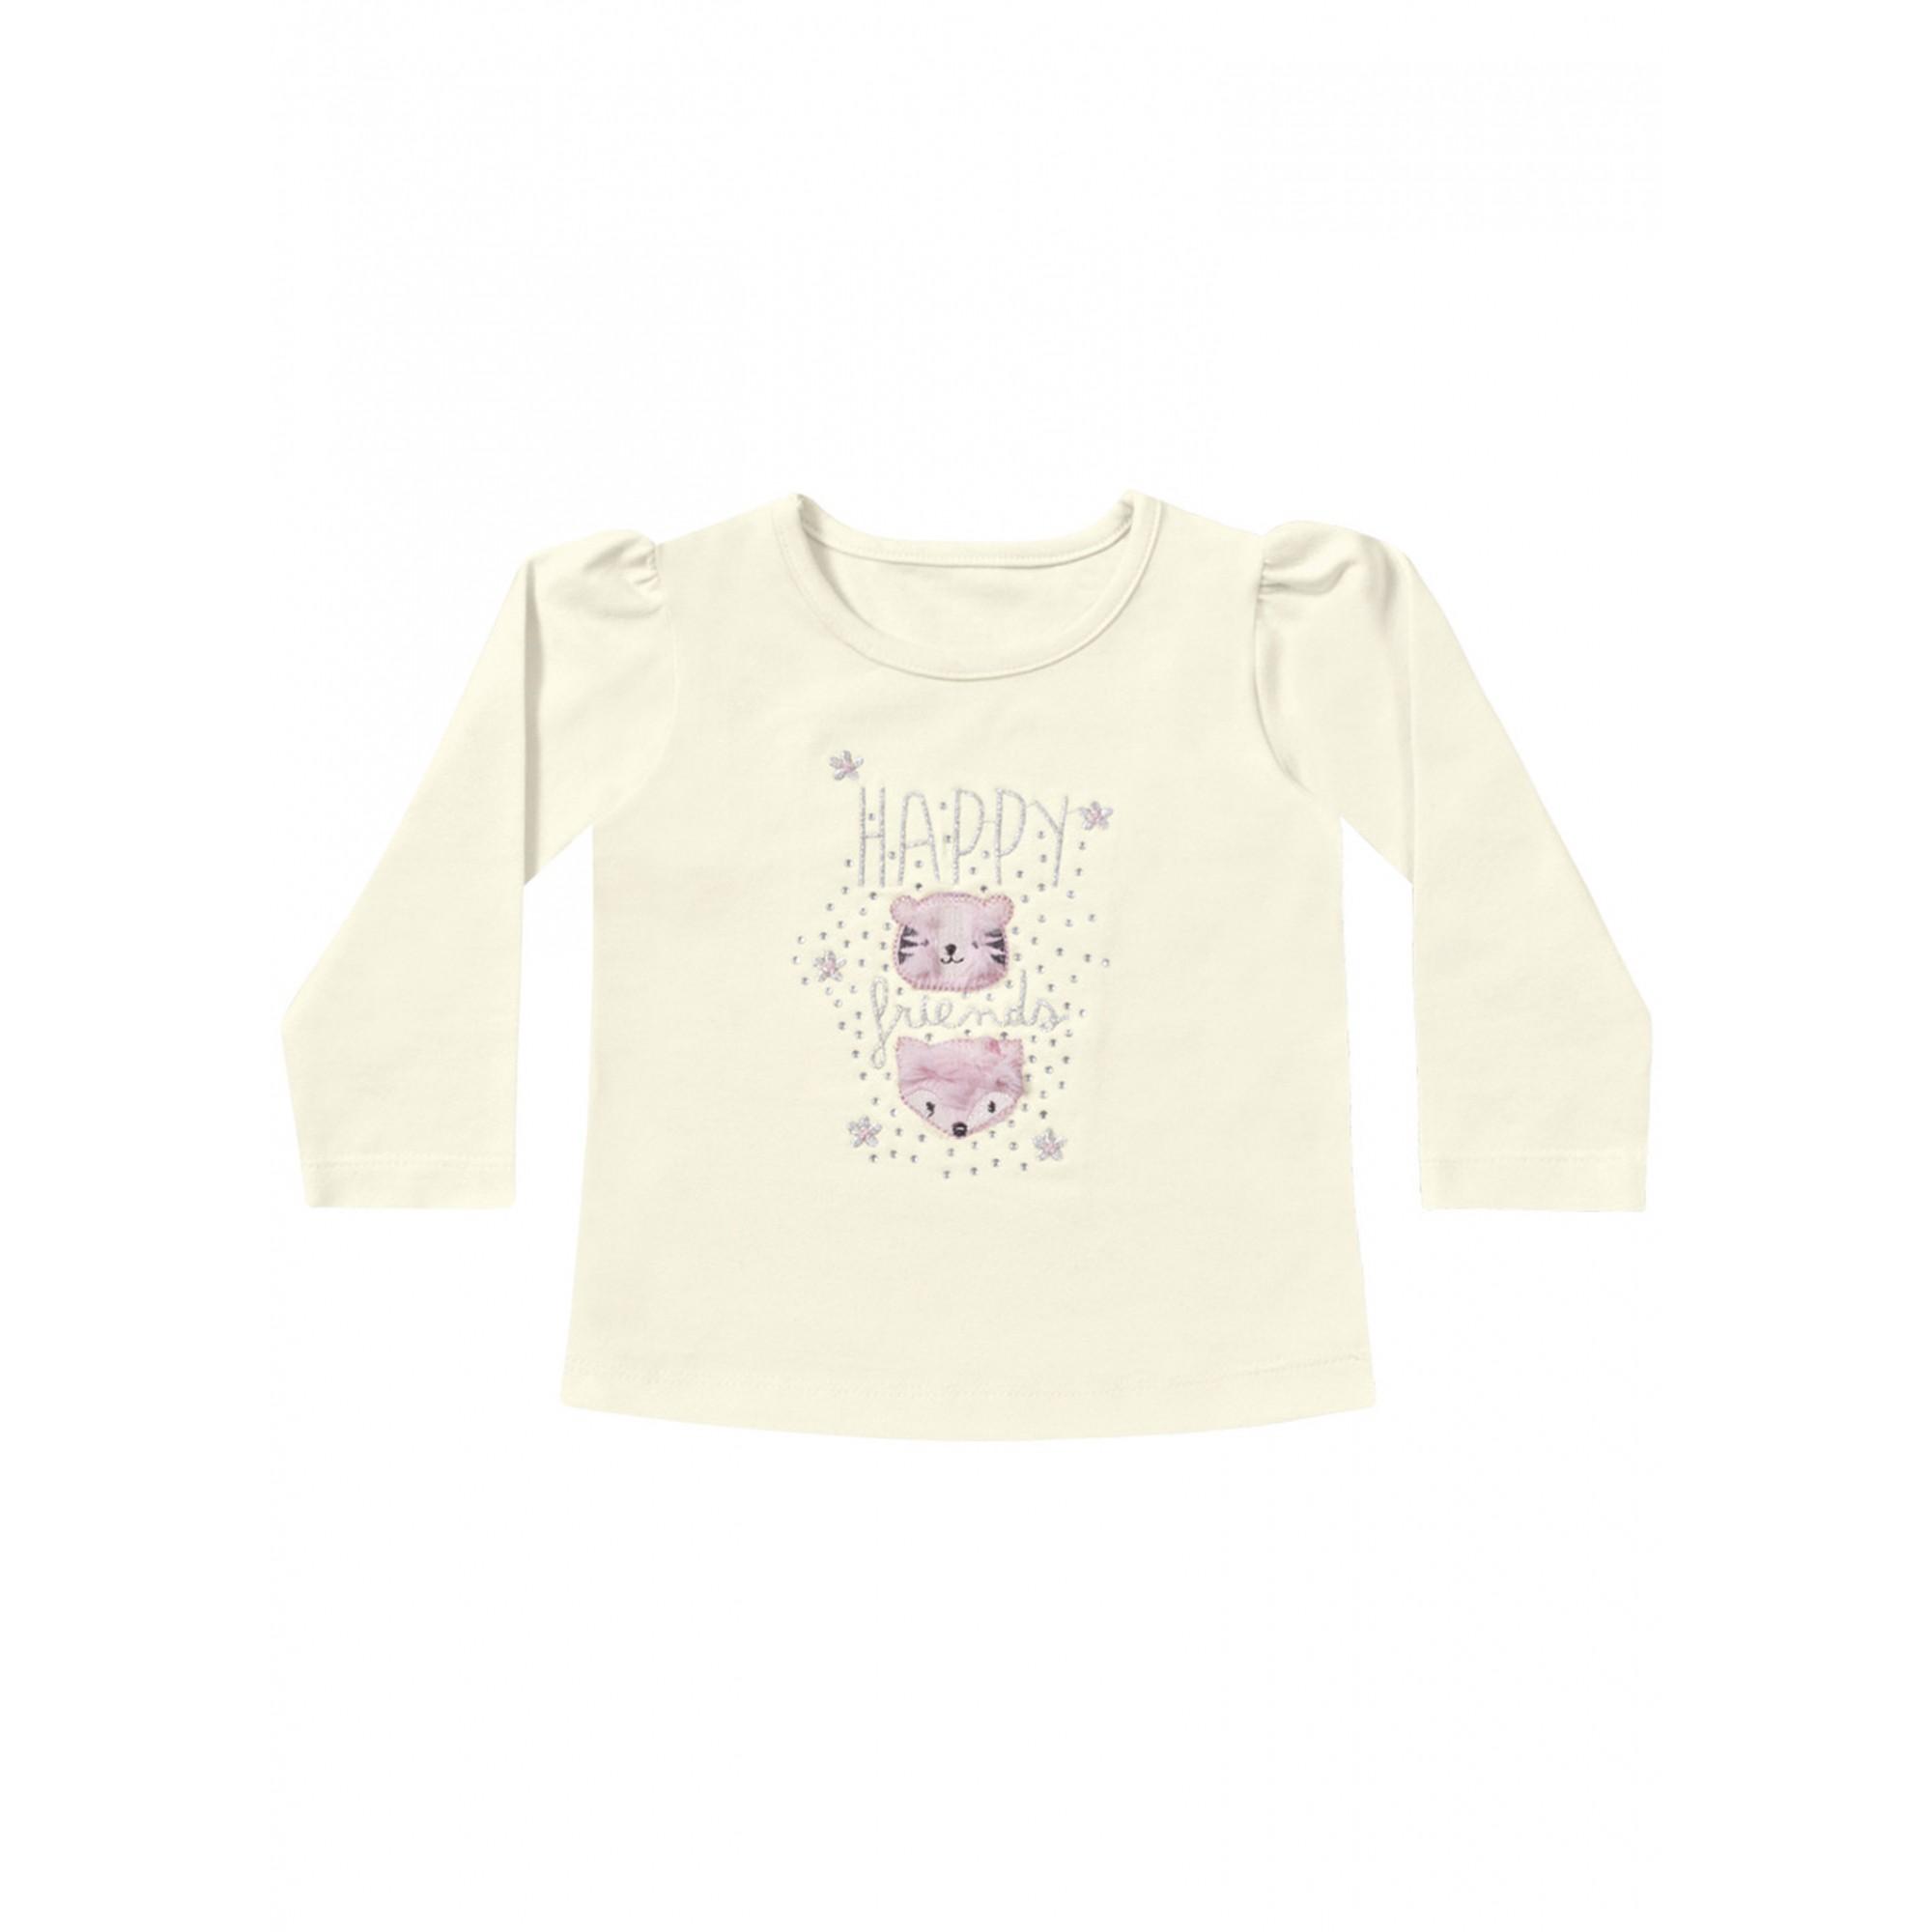 Blusa infantil feminina para bebê Happy Friends Playground